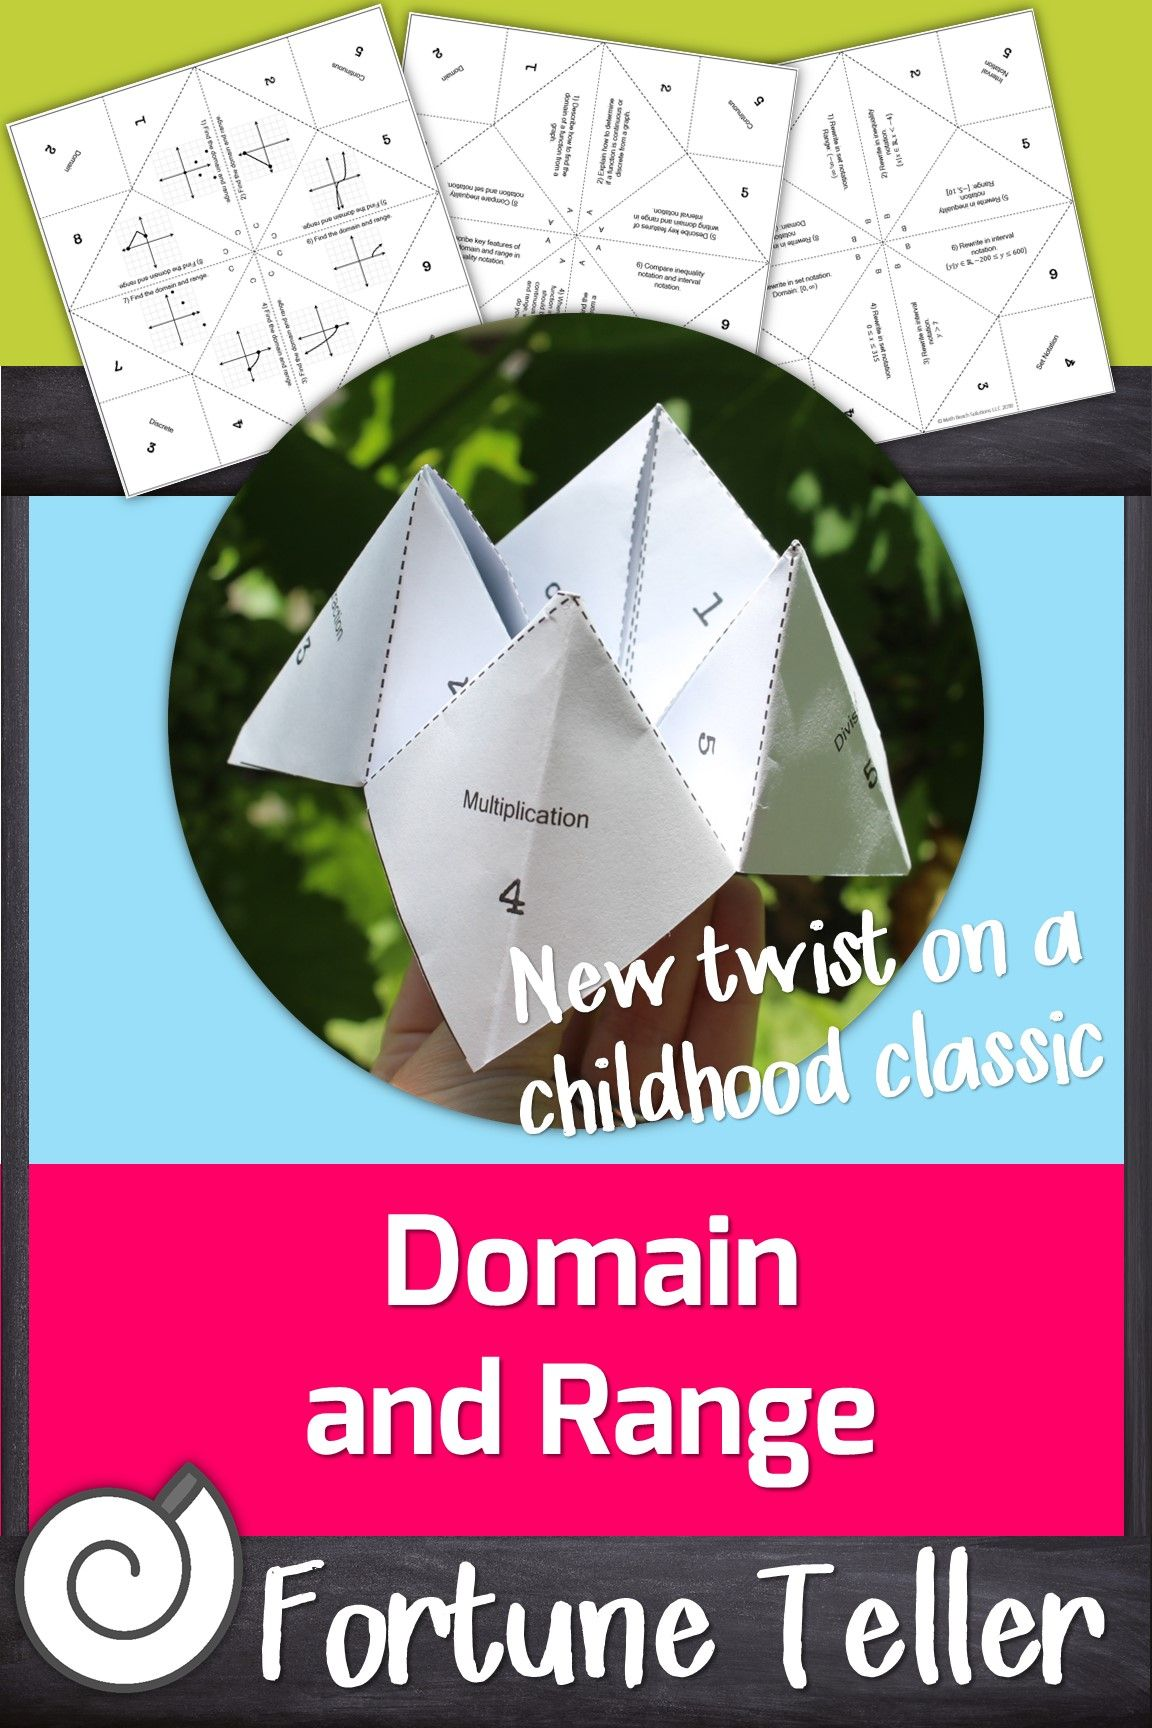 Domain And Range Fortune Teller Activity